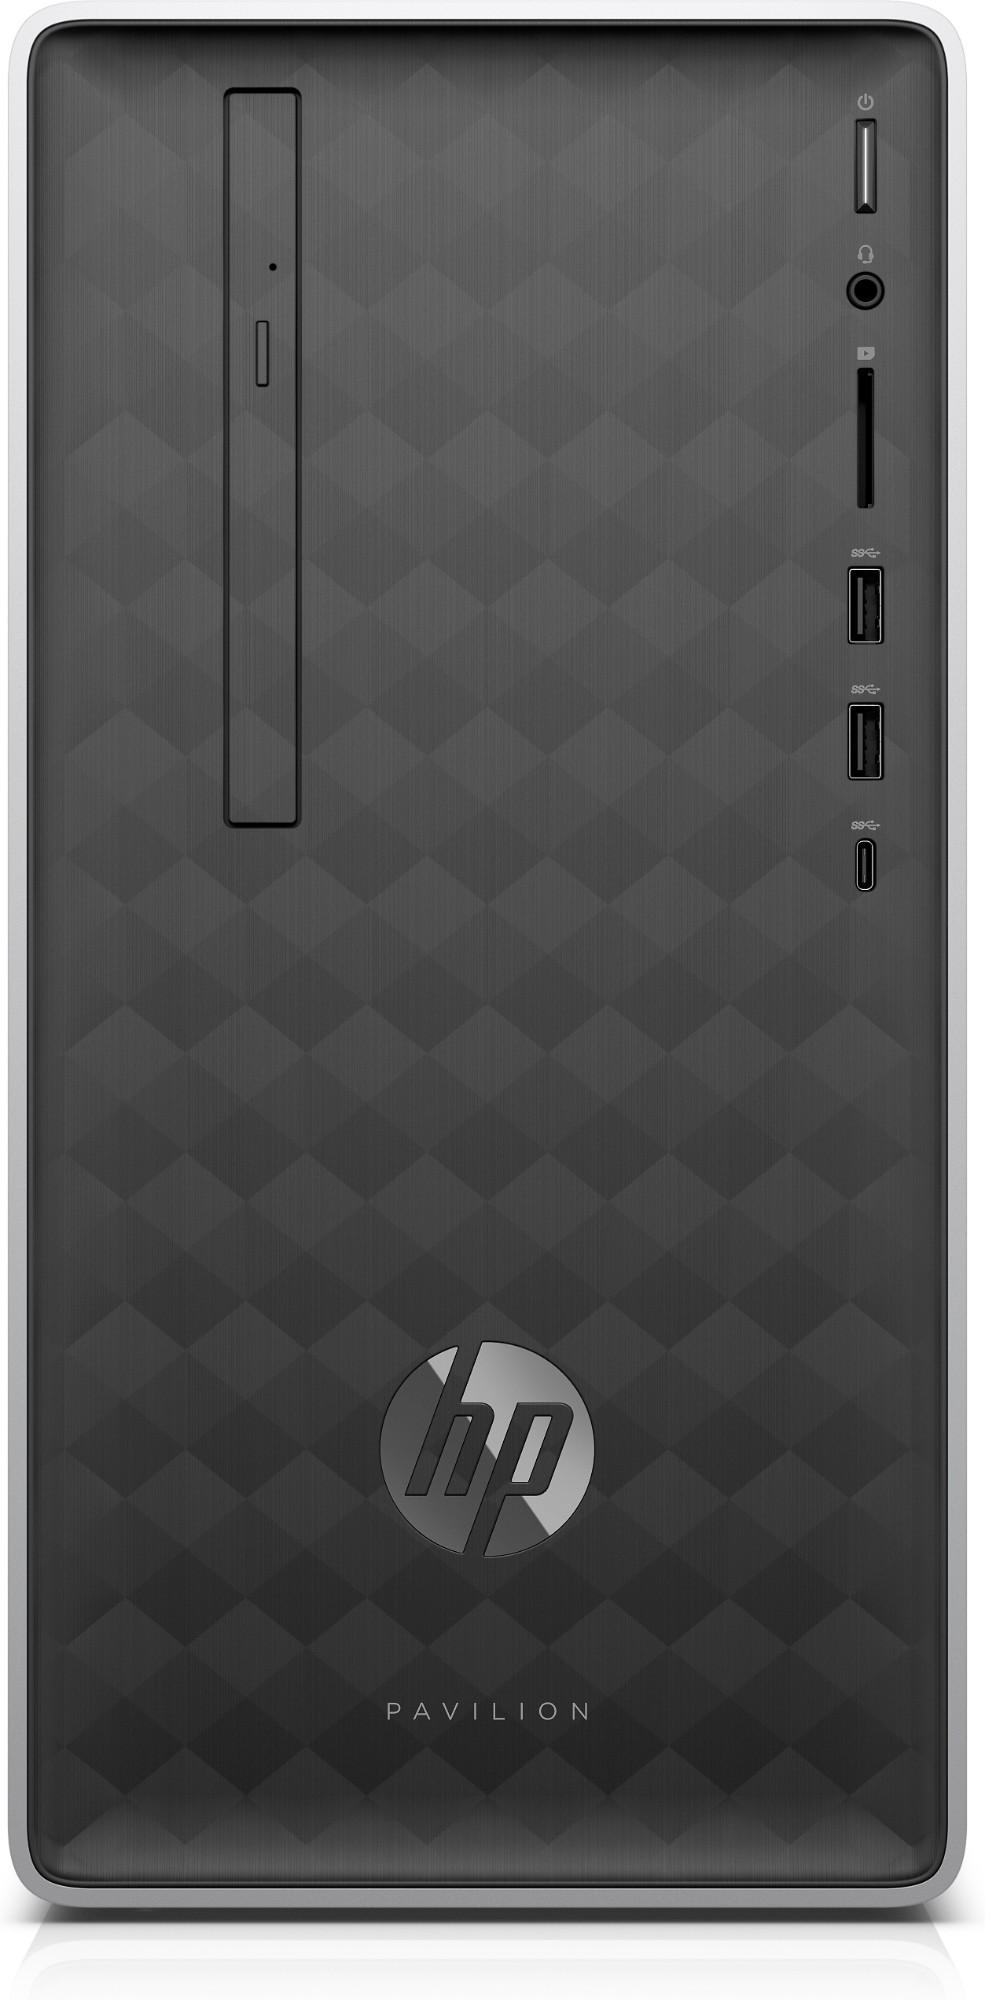 HP Pavilion 590-a0020na Intel® Celeron® J4005 4 GB DDR4-SDRAM 1000 GB HDD Silver Mini Tower PC